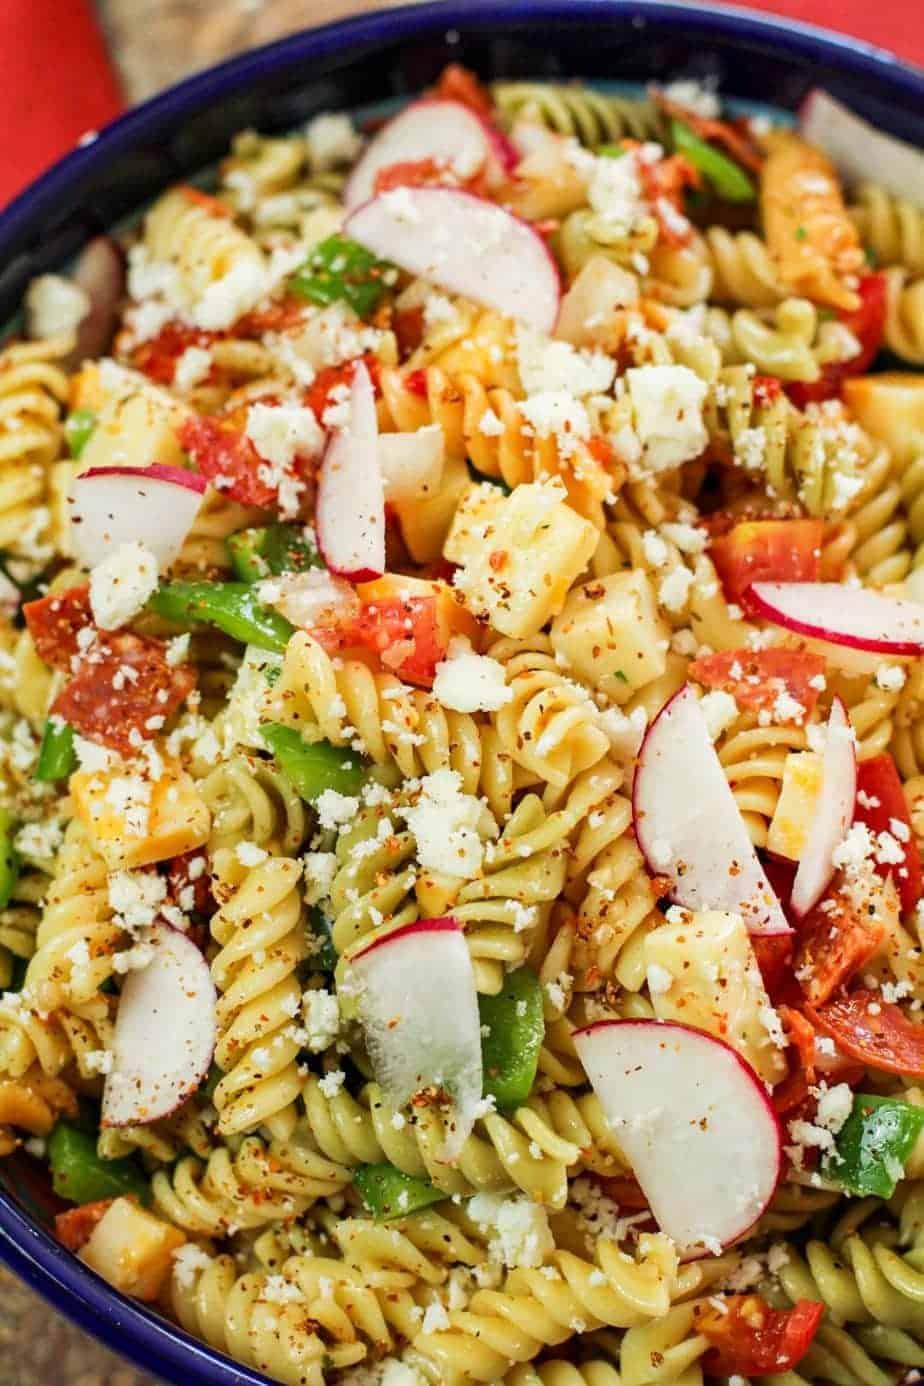 Spicy Pasta Salad 3 of 10